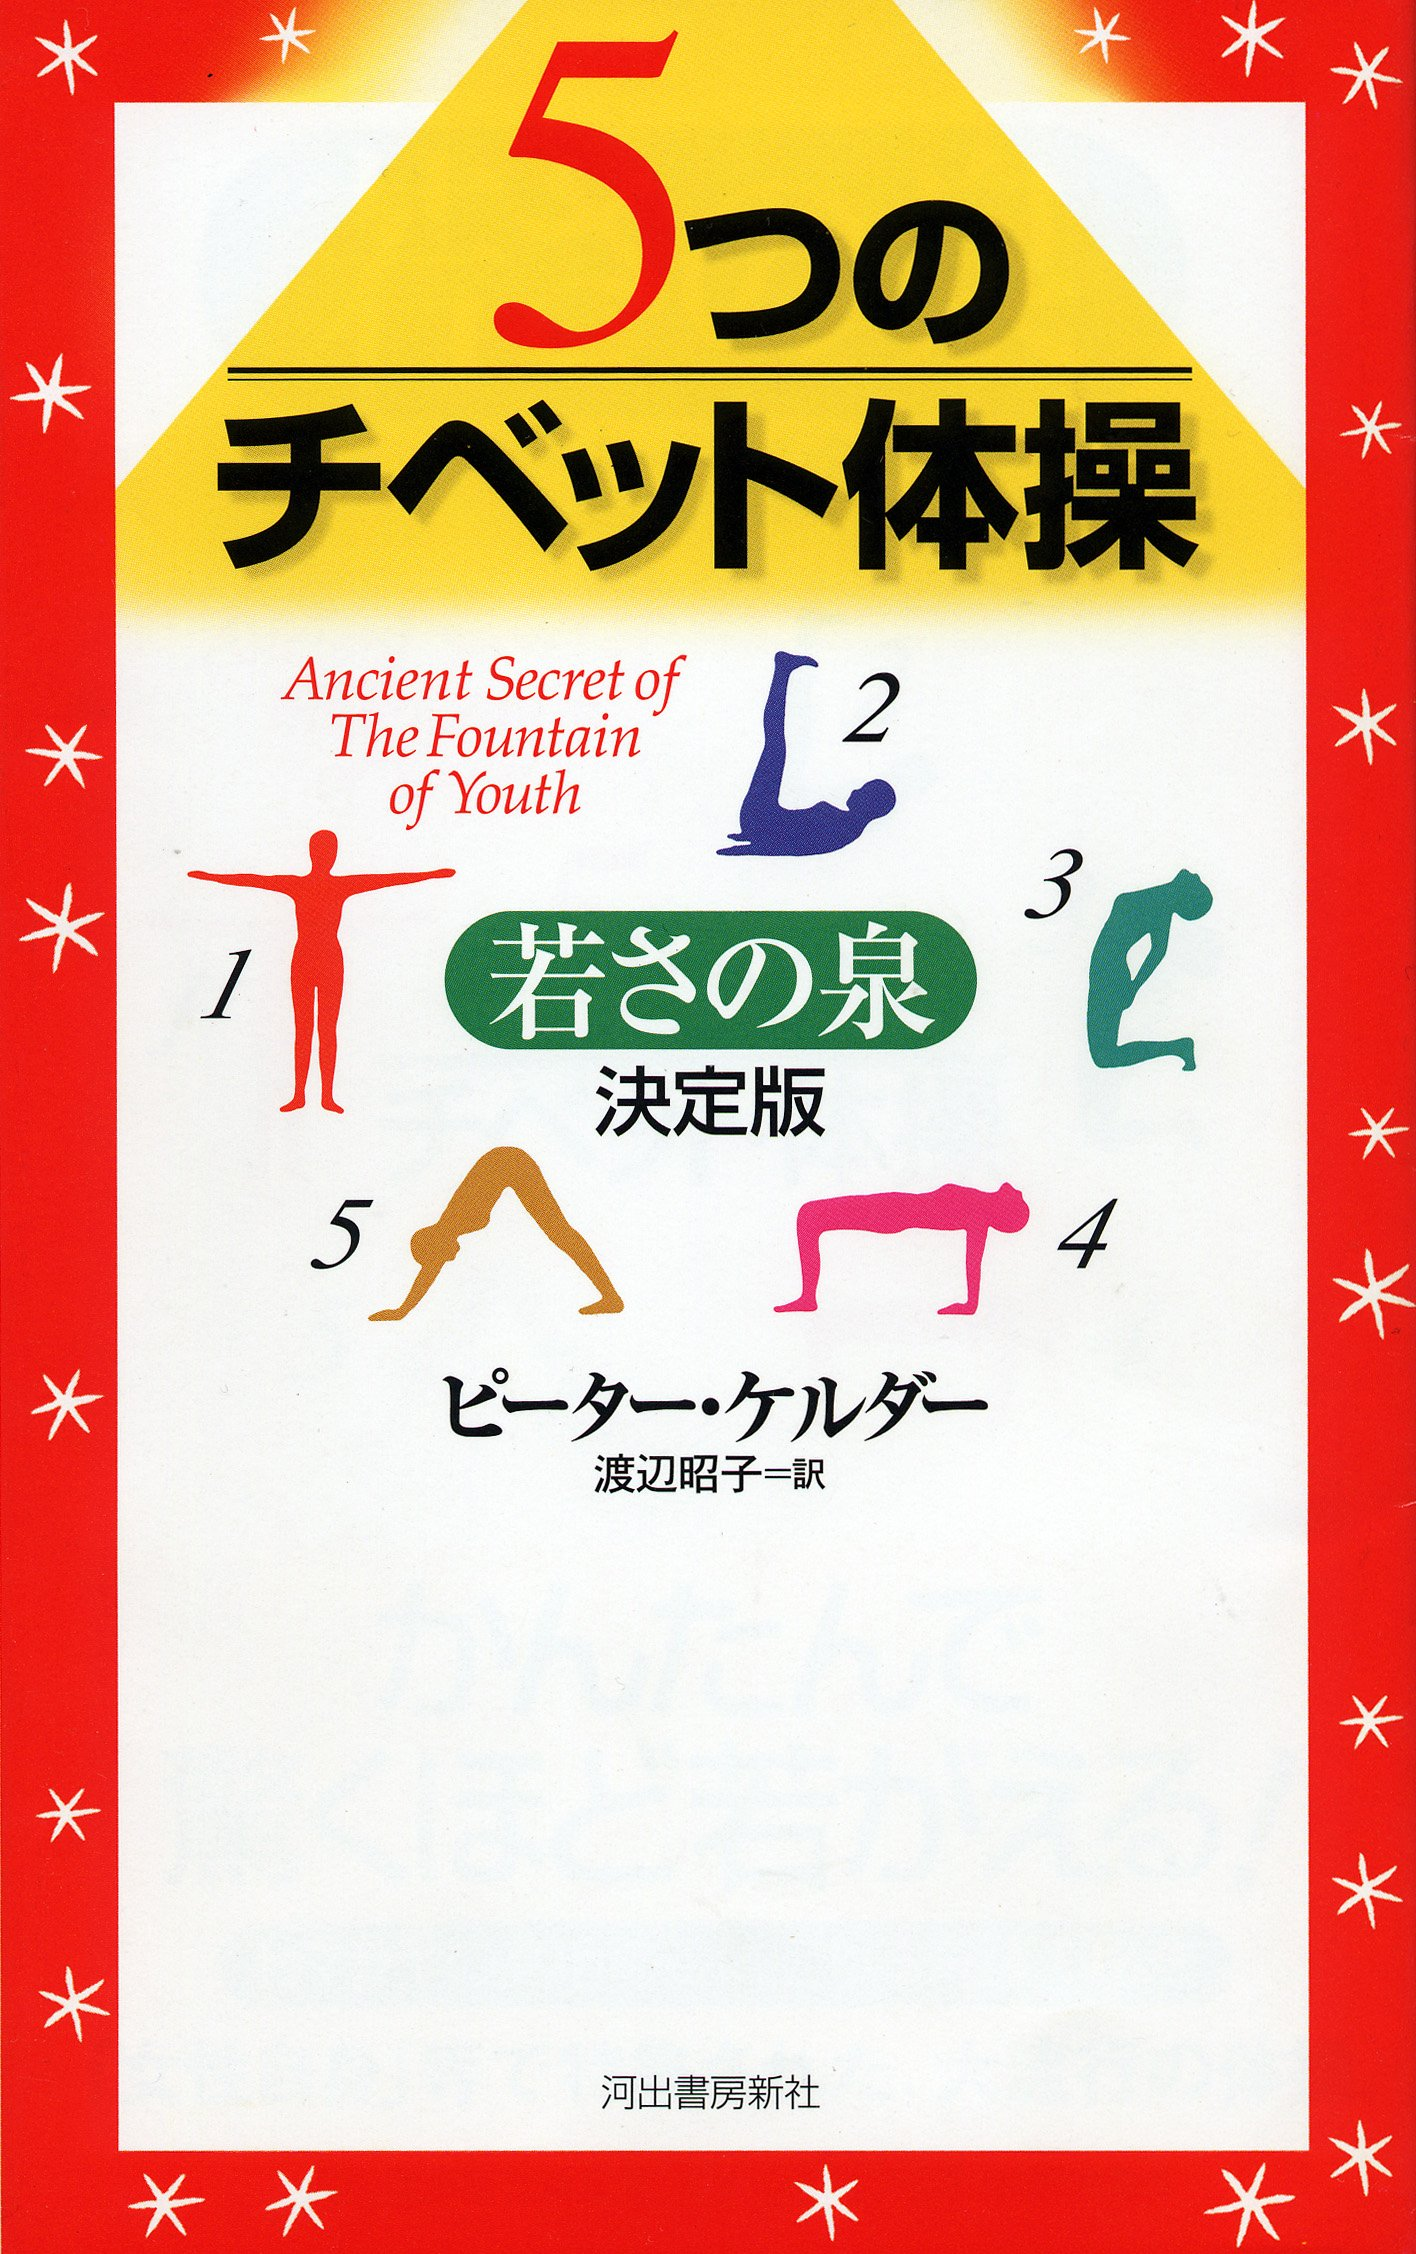 Read Online Tibetan Gymnastics of one 5 - - Izumi choice of the youth (2005) ISBN: 4309268137 [Japanese Import] PDF